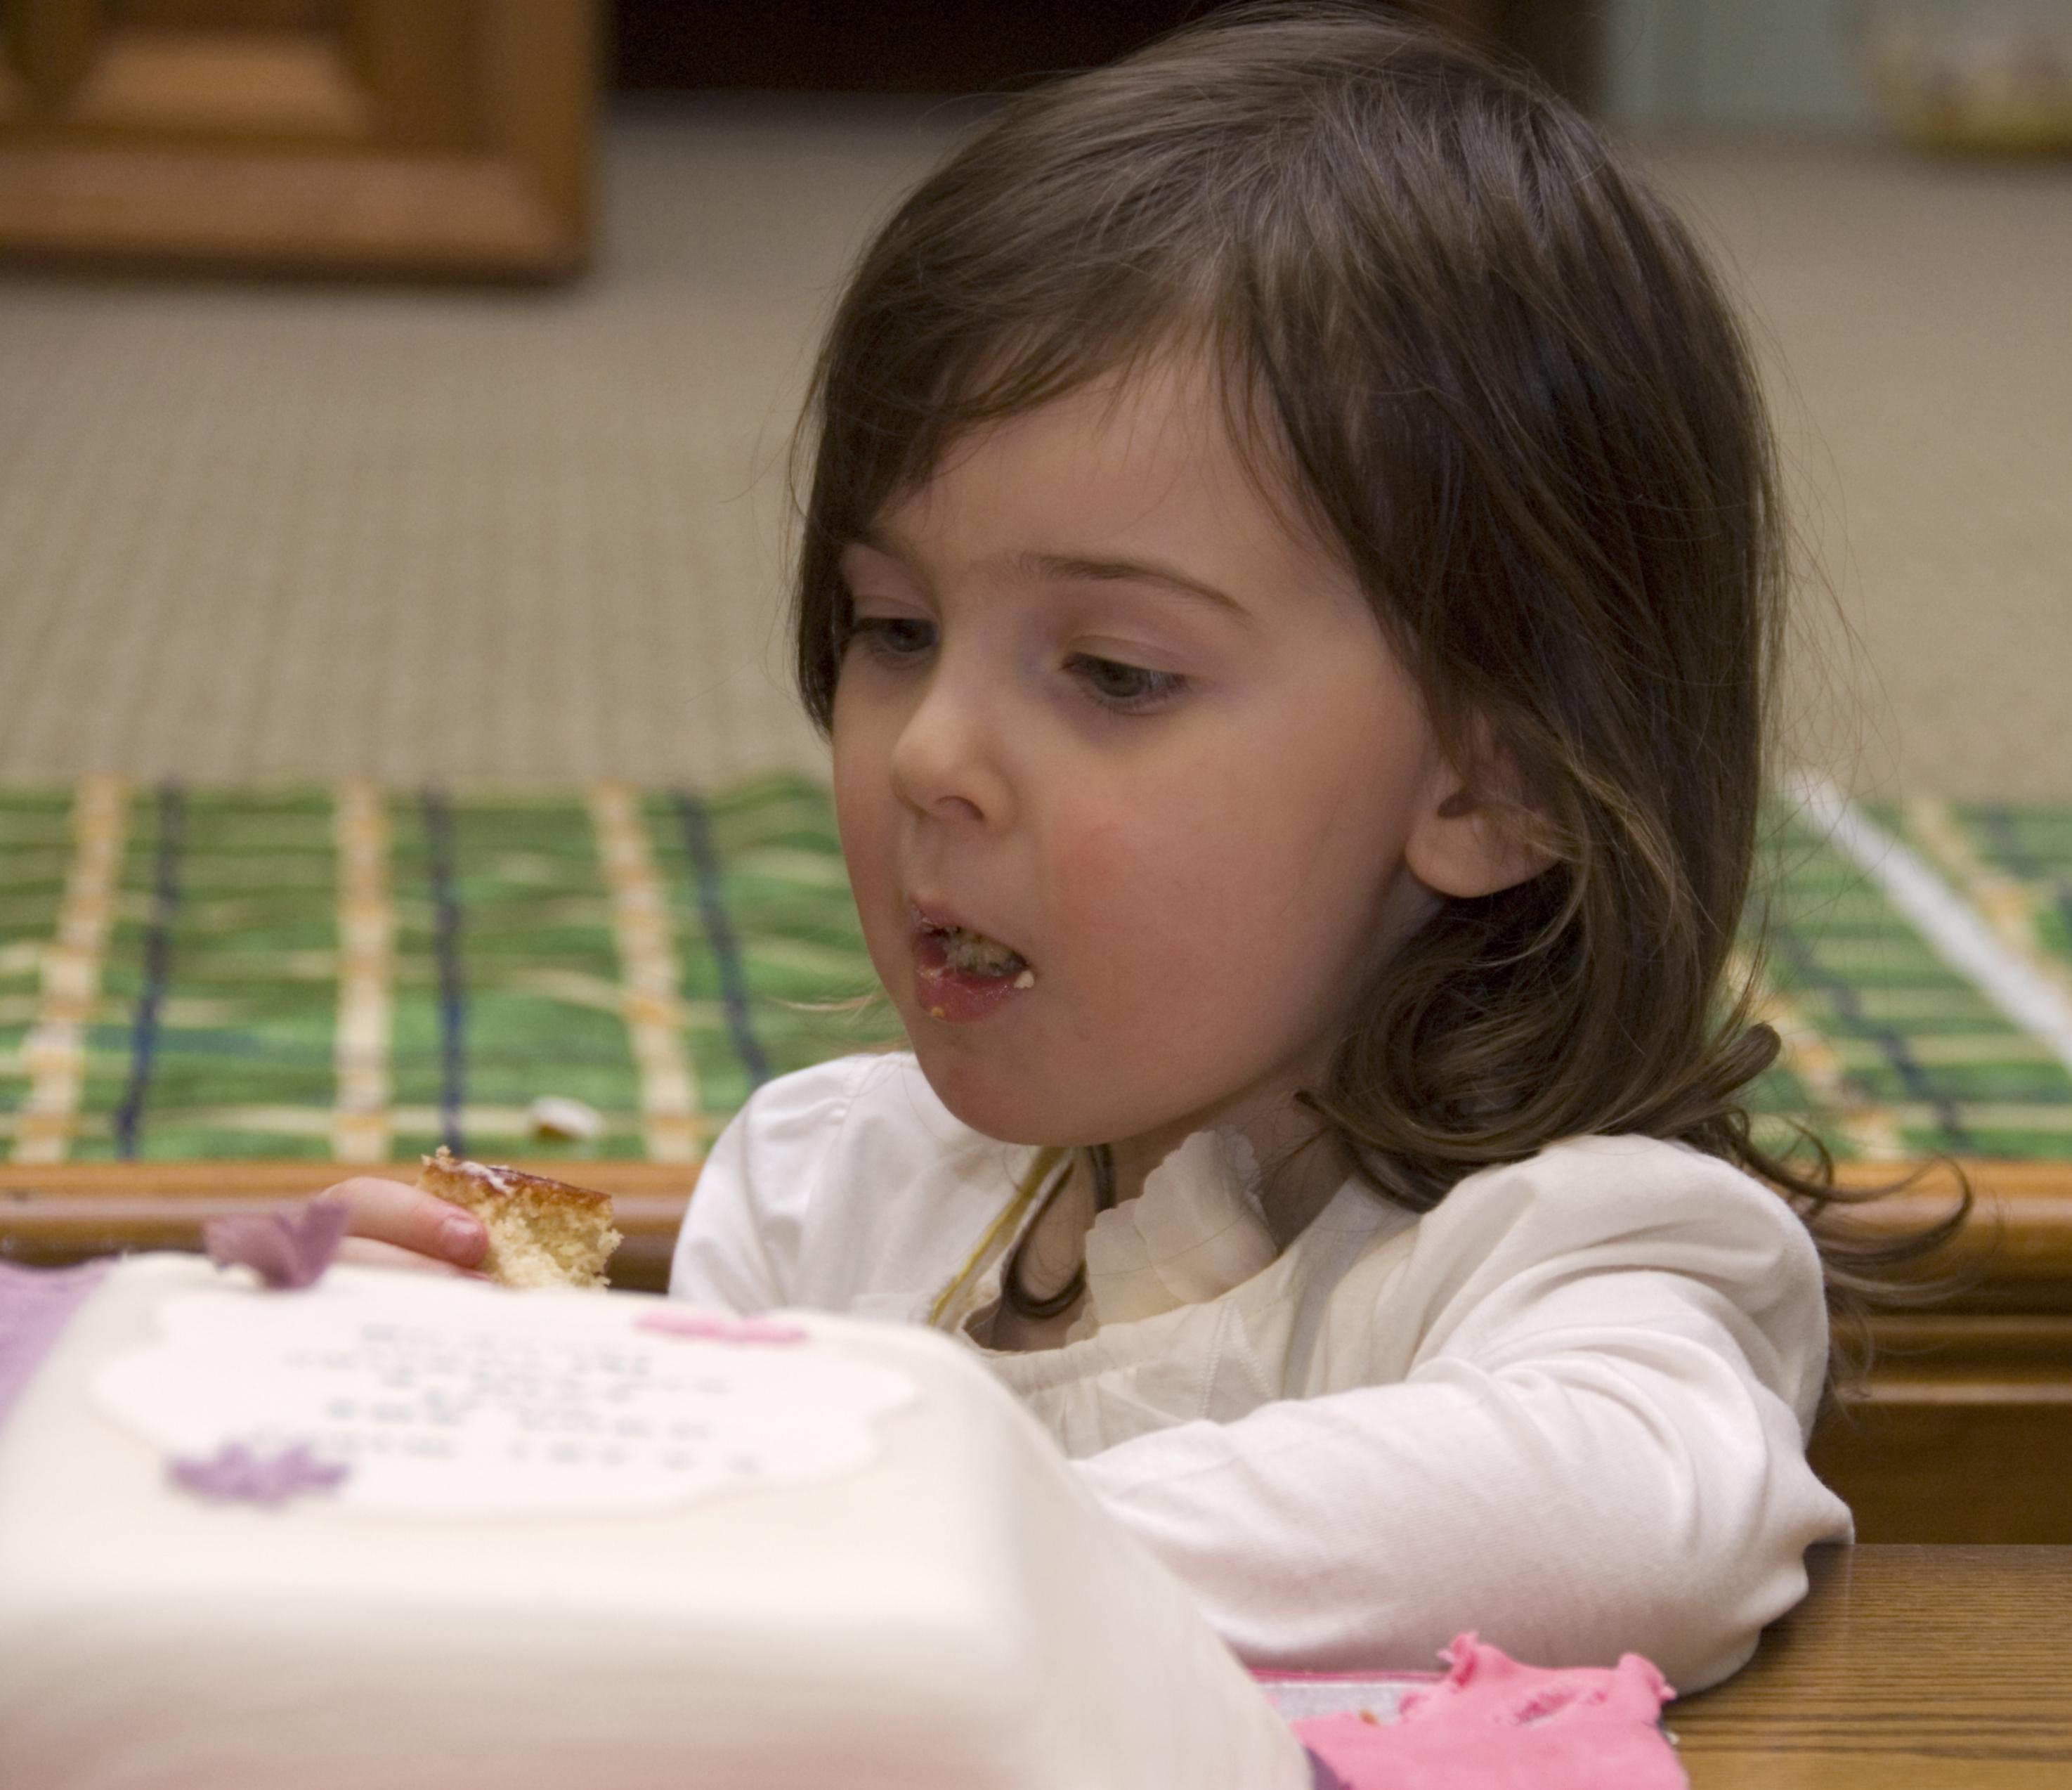 Yummy cake, Agnes!